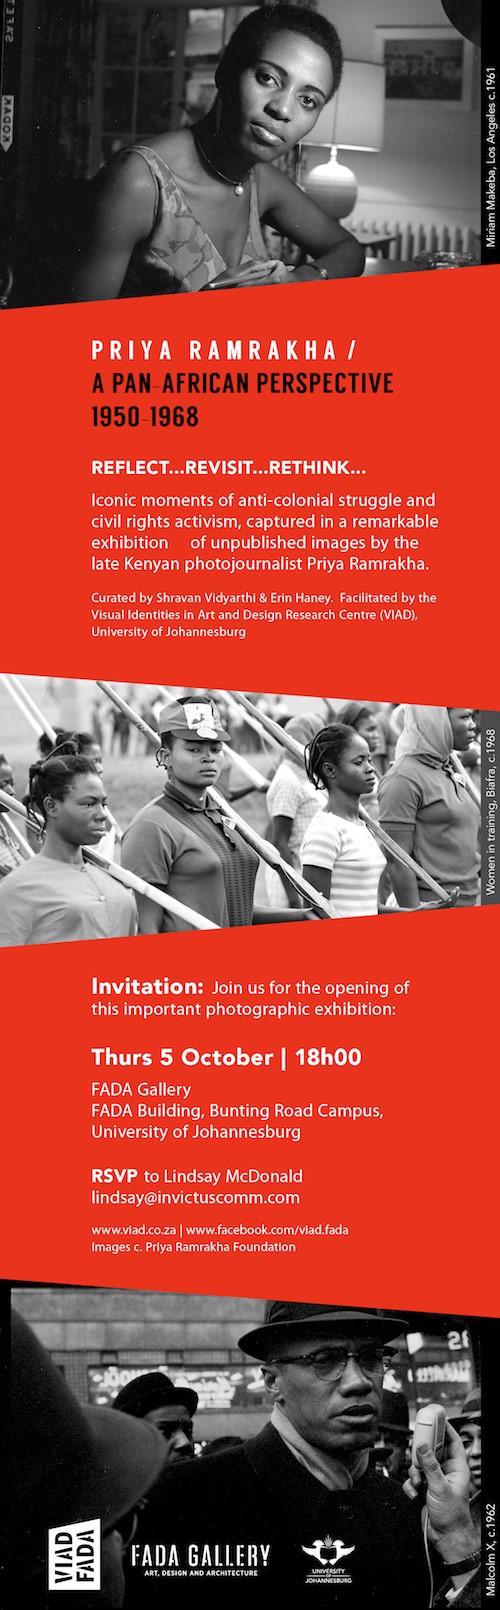 Priya Ramrakha FADA Gallery Johannesburg South Africa Flyer